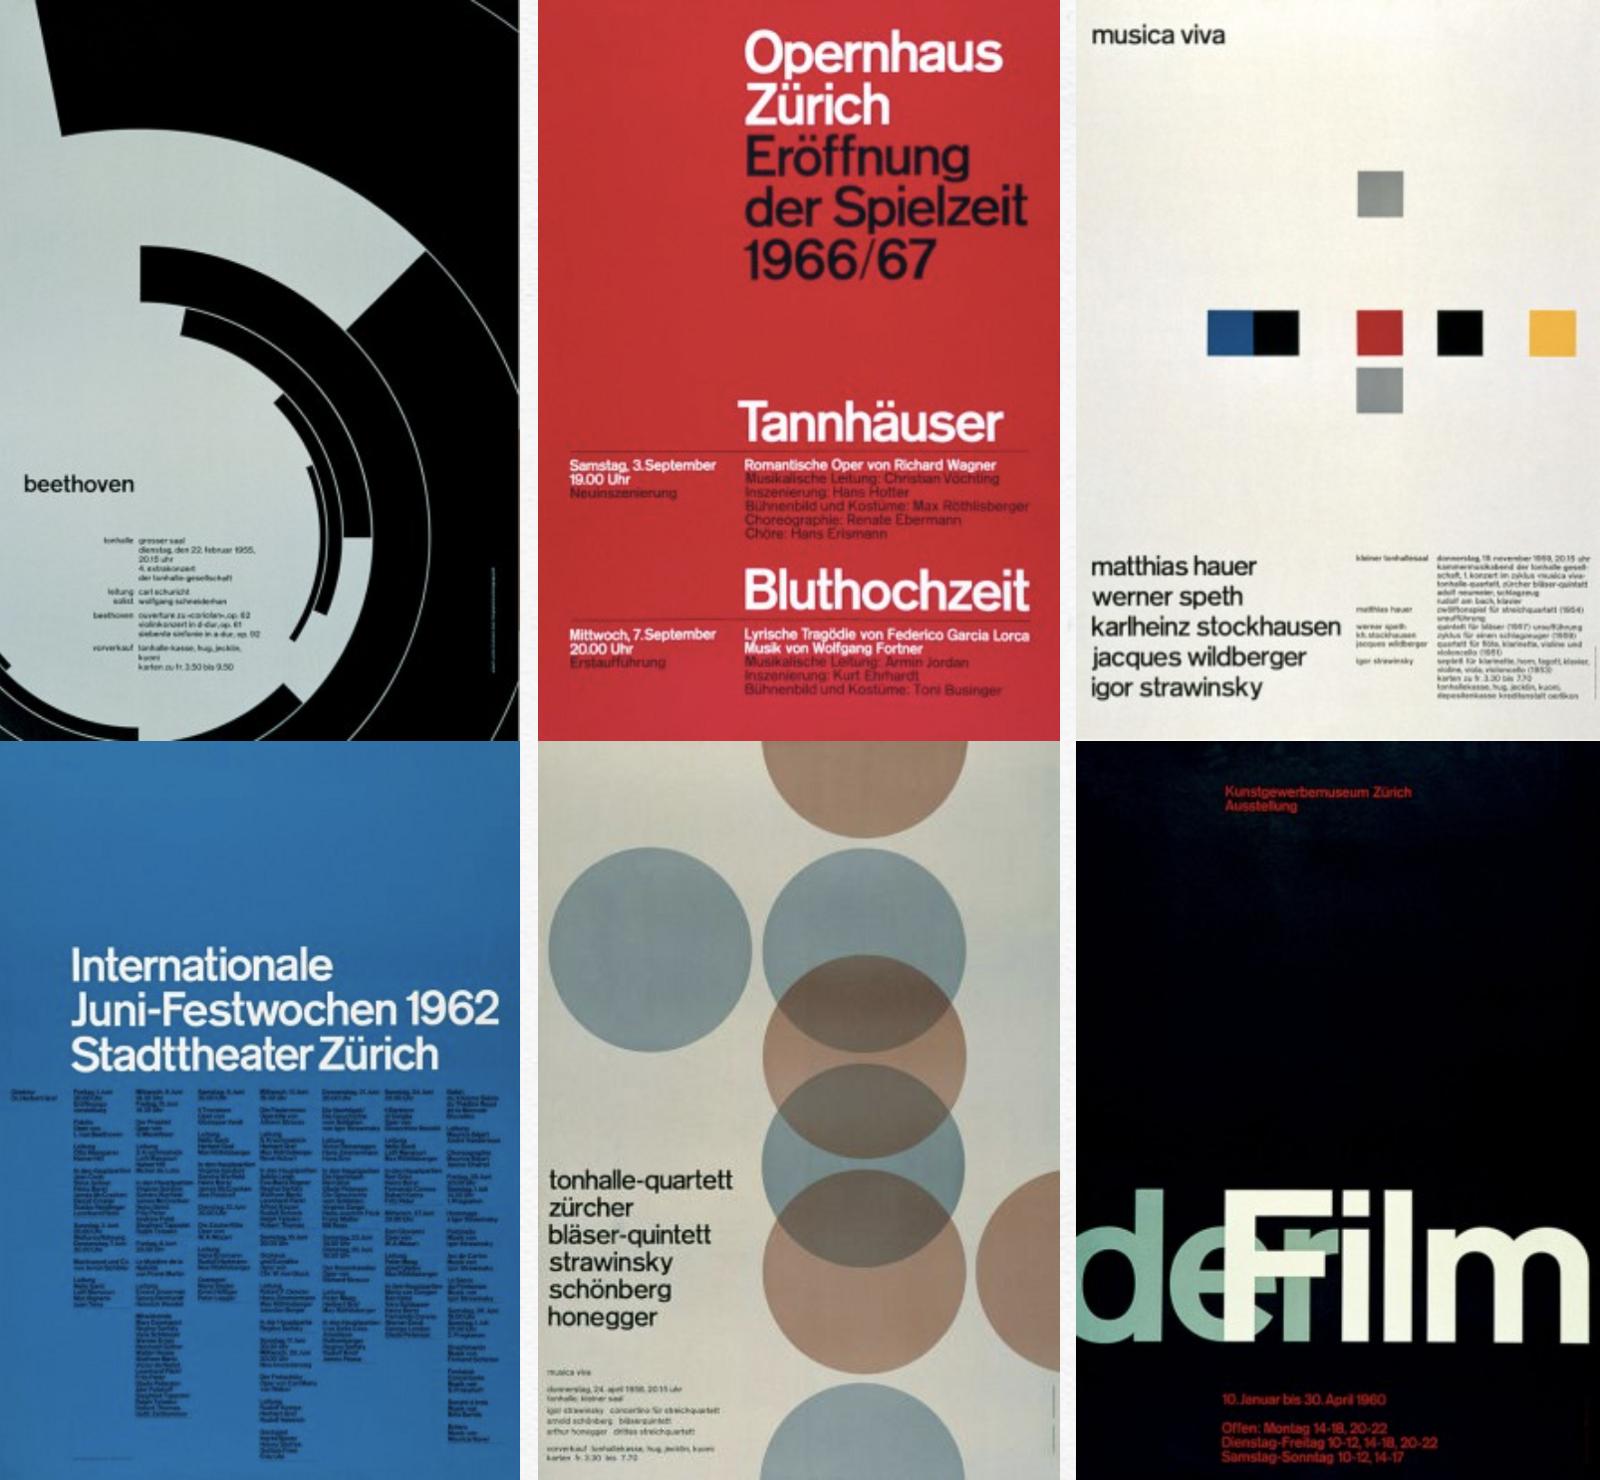 Poster designs by Josef Muller Brockmann